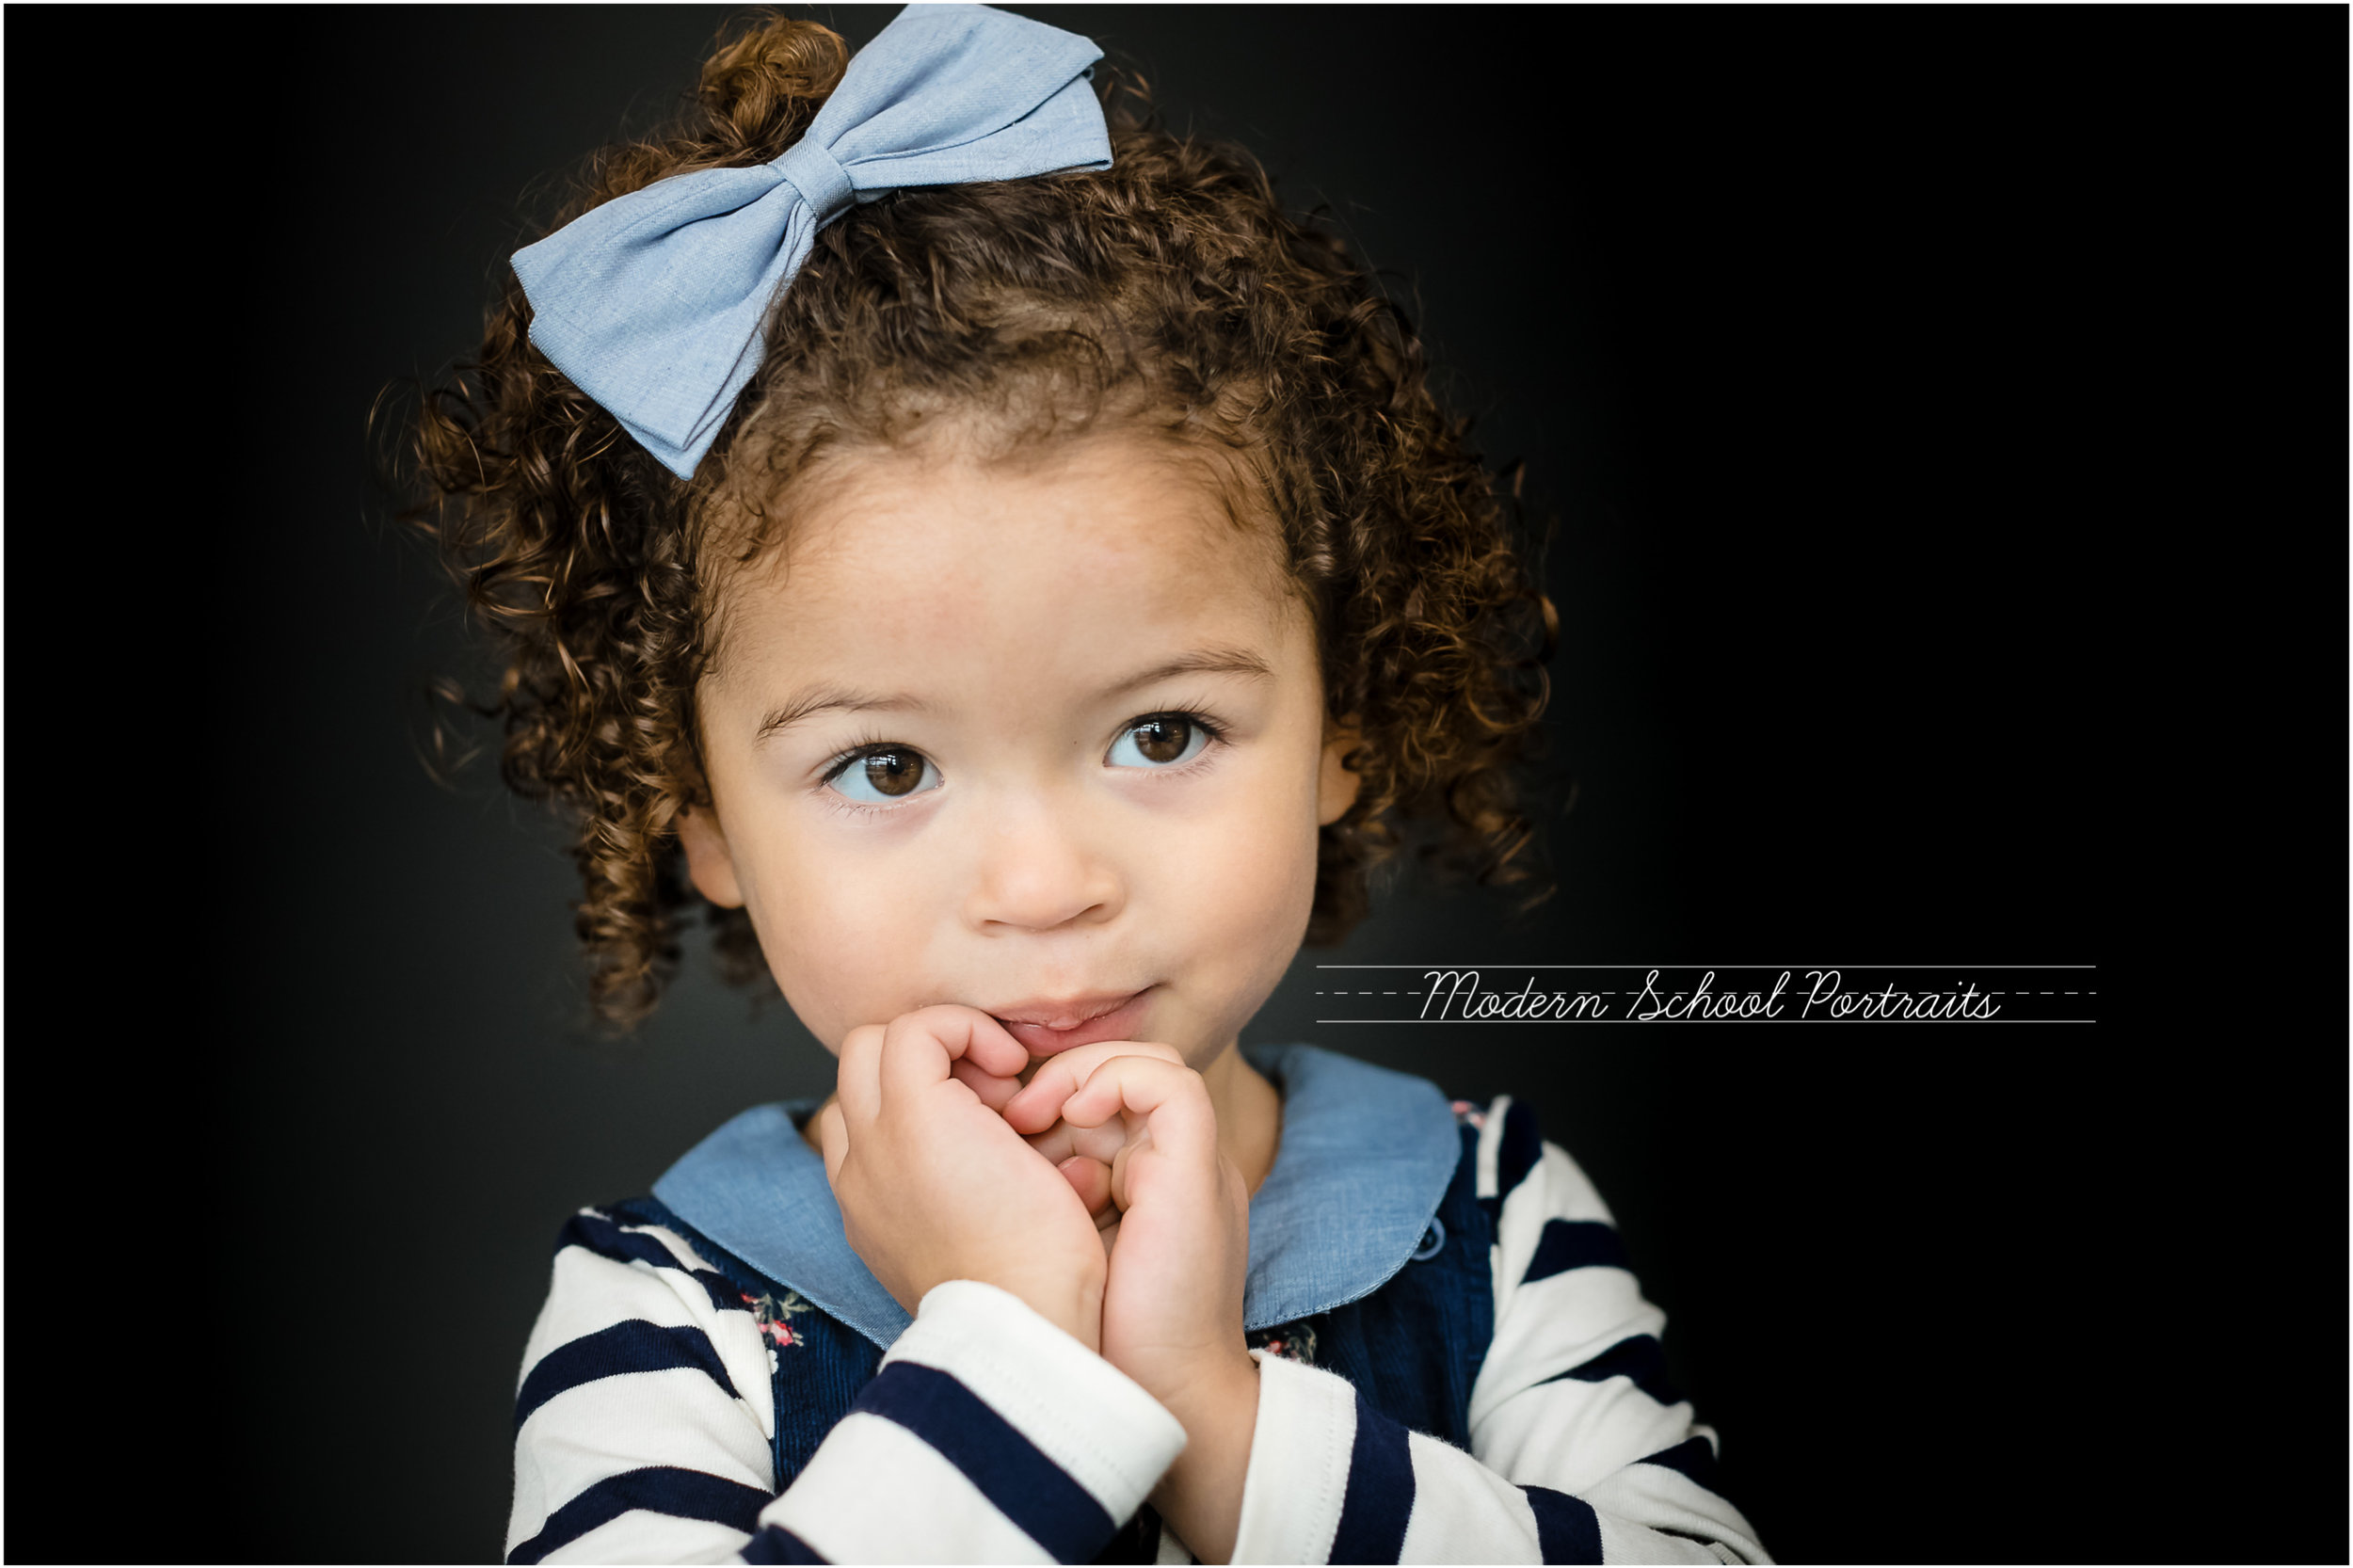 MIXED CURLY HAIR GIRL MONROE FALL18 MODERN SCHOOL PORTRAITS CHICAGO WHIPPLE.jpg